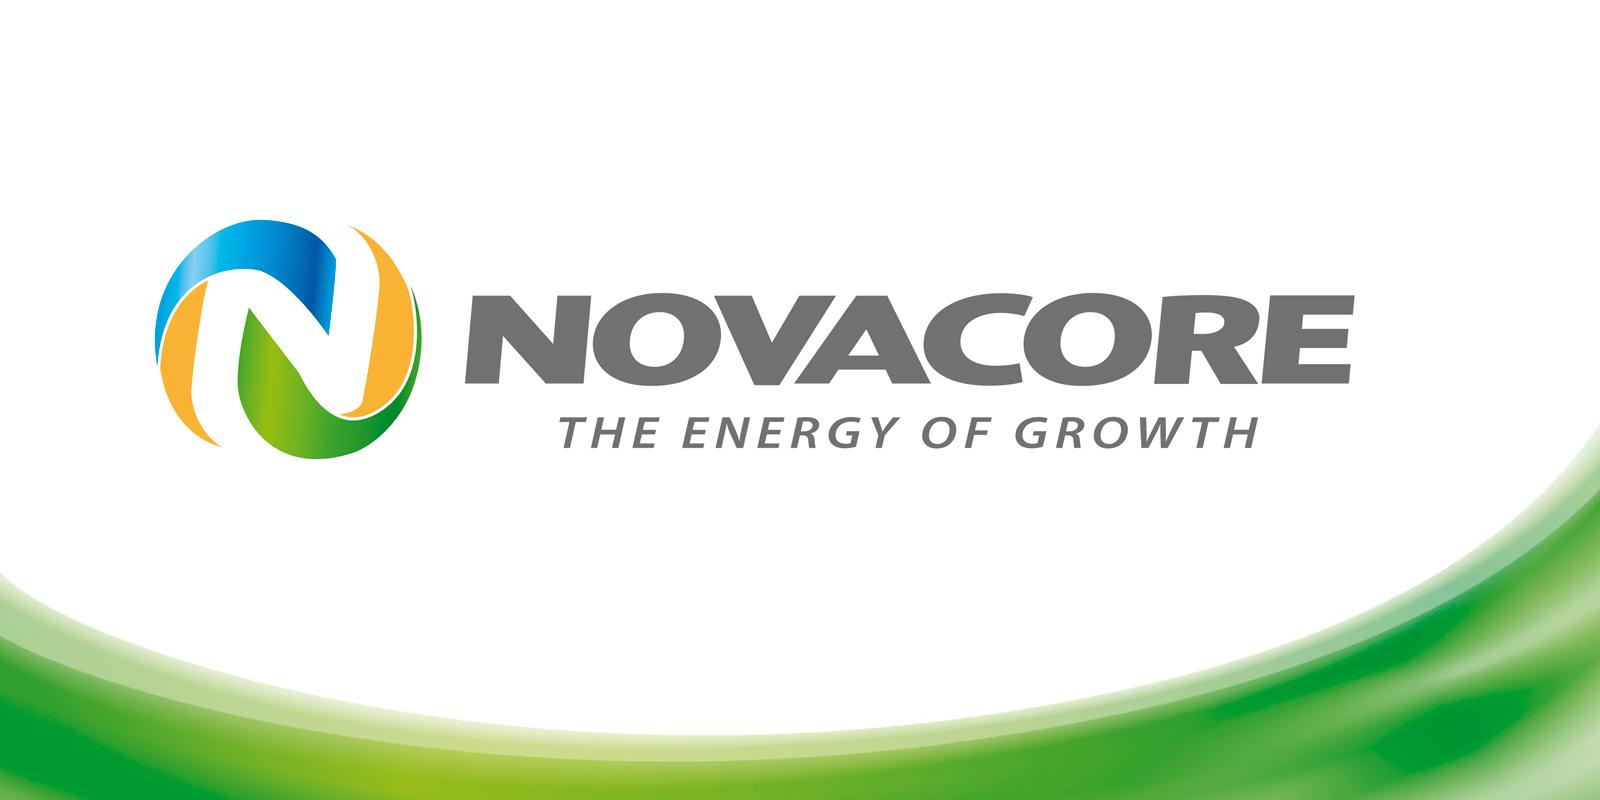 Премиксный завод Novacore;;;;;;Разработка имени и слогана;;;;;;<span>Клиент:</span> Премиксный завод Novacore;;;;;;;;;;;;Разработанное имя: <nm>«Novаcore»</nm><br> Разработанный слоган: <nm>«ENERGY OF GROWTH»</nm>;;;;;; 8 ;;;;;;